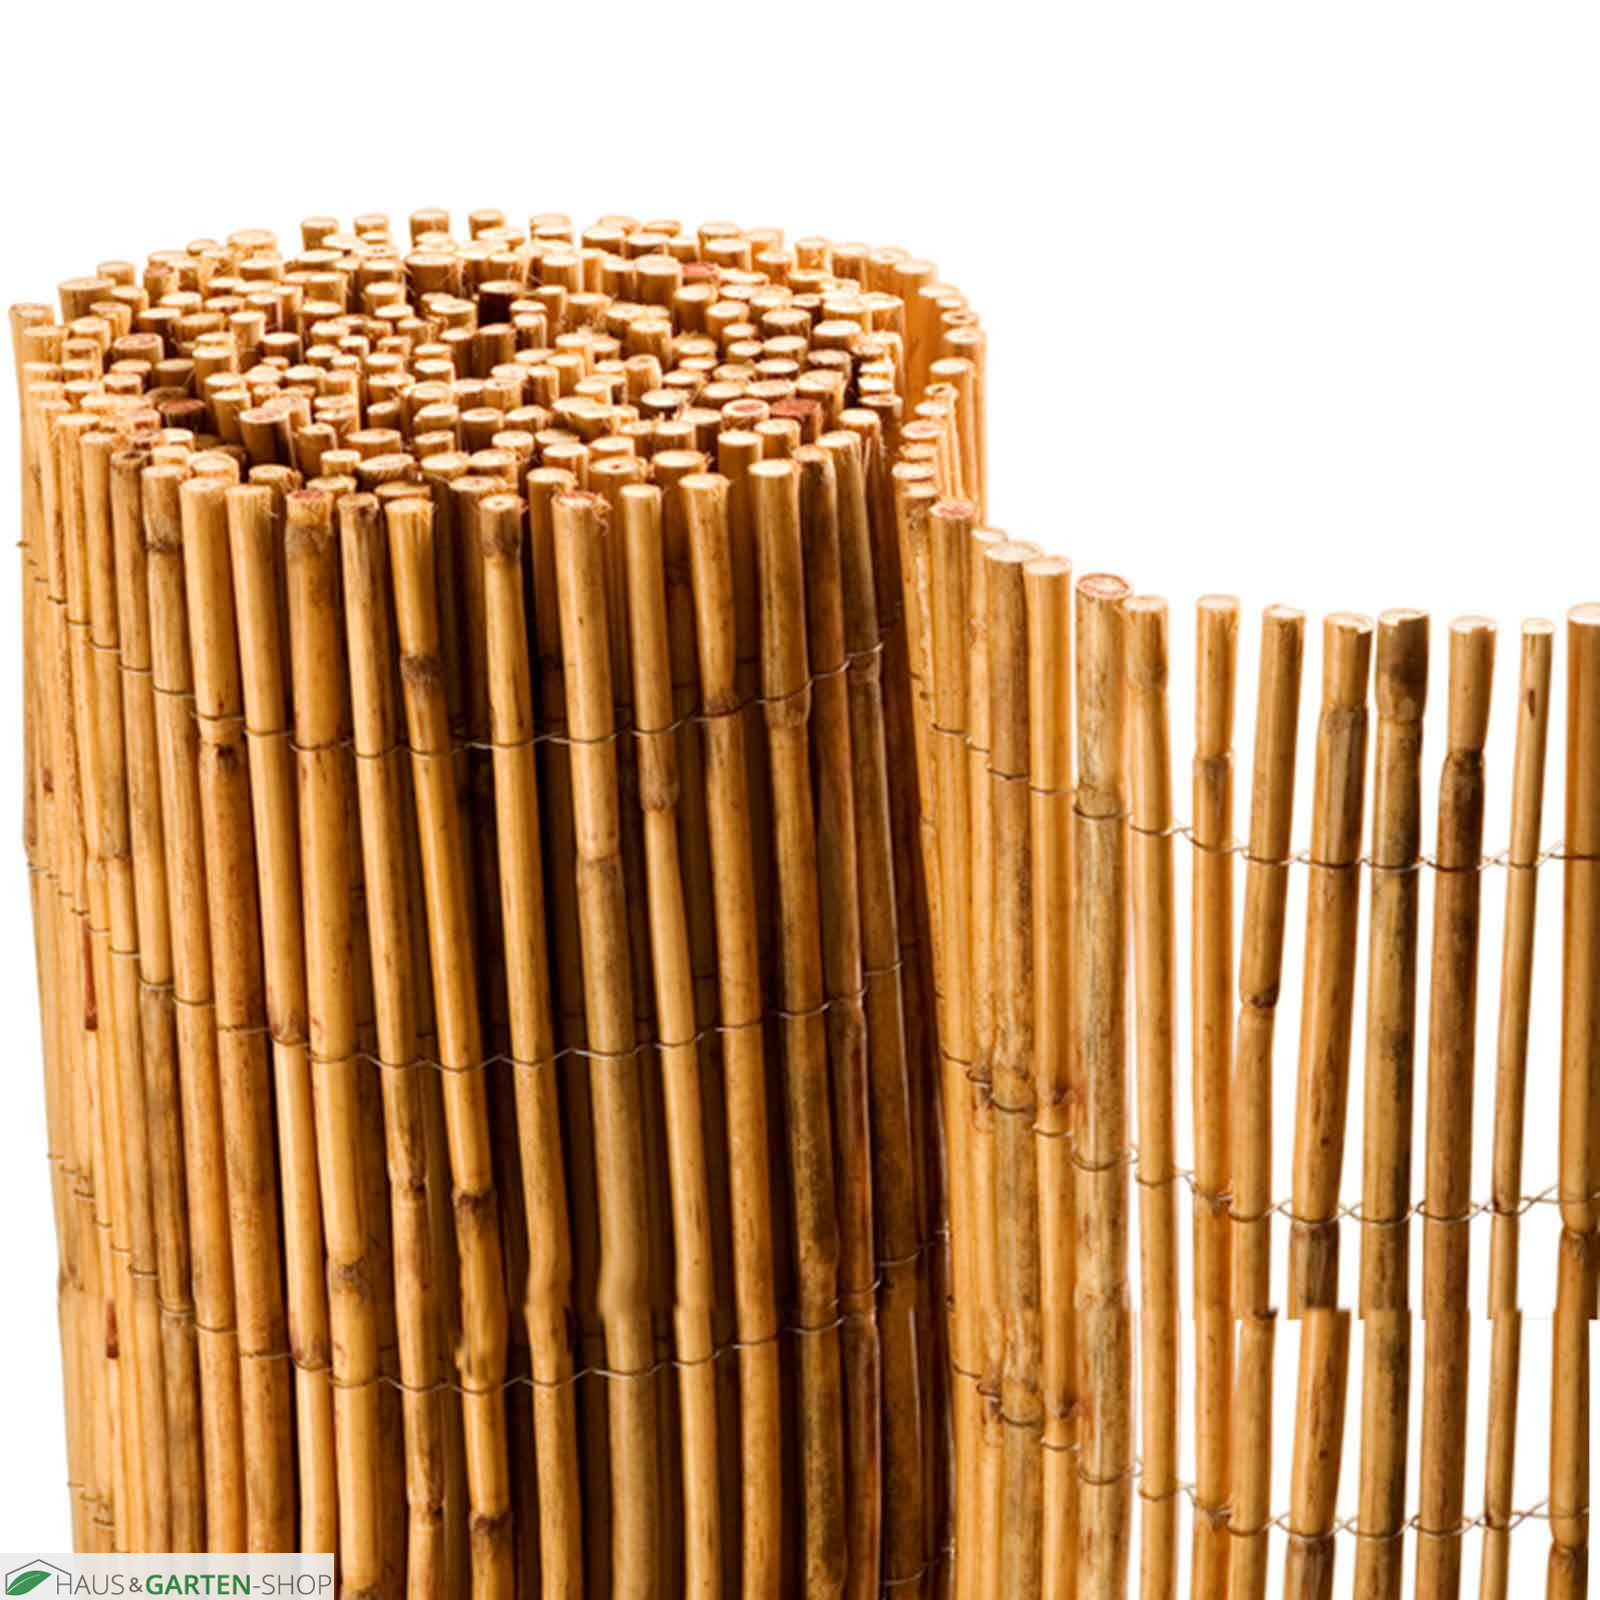 bambusmatte bangkog bambus sichtschutz verzinkten draht. Black Bedroom Furniture Sets. Home Design Ideas